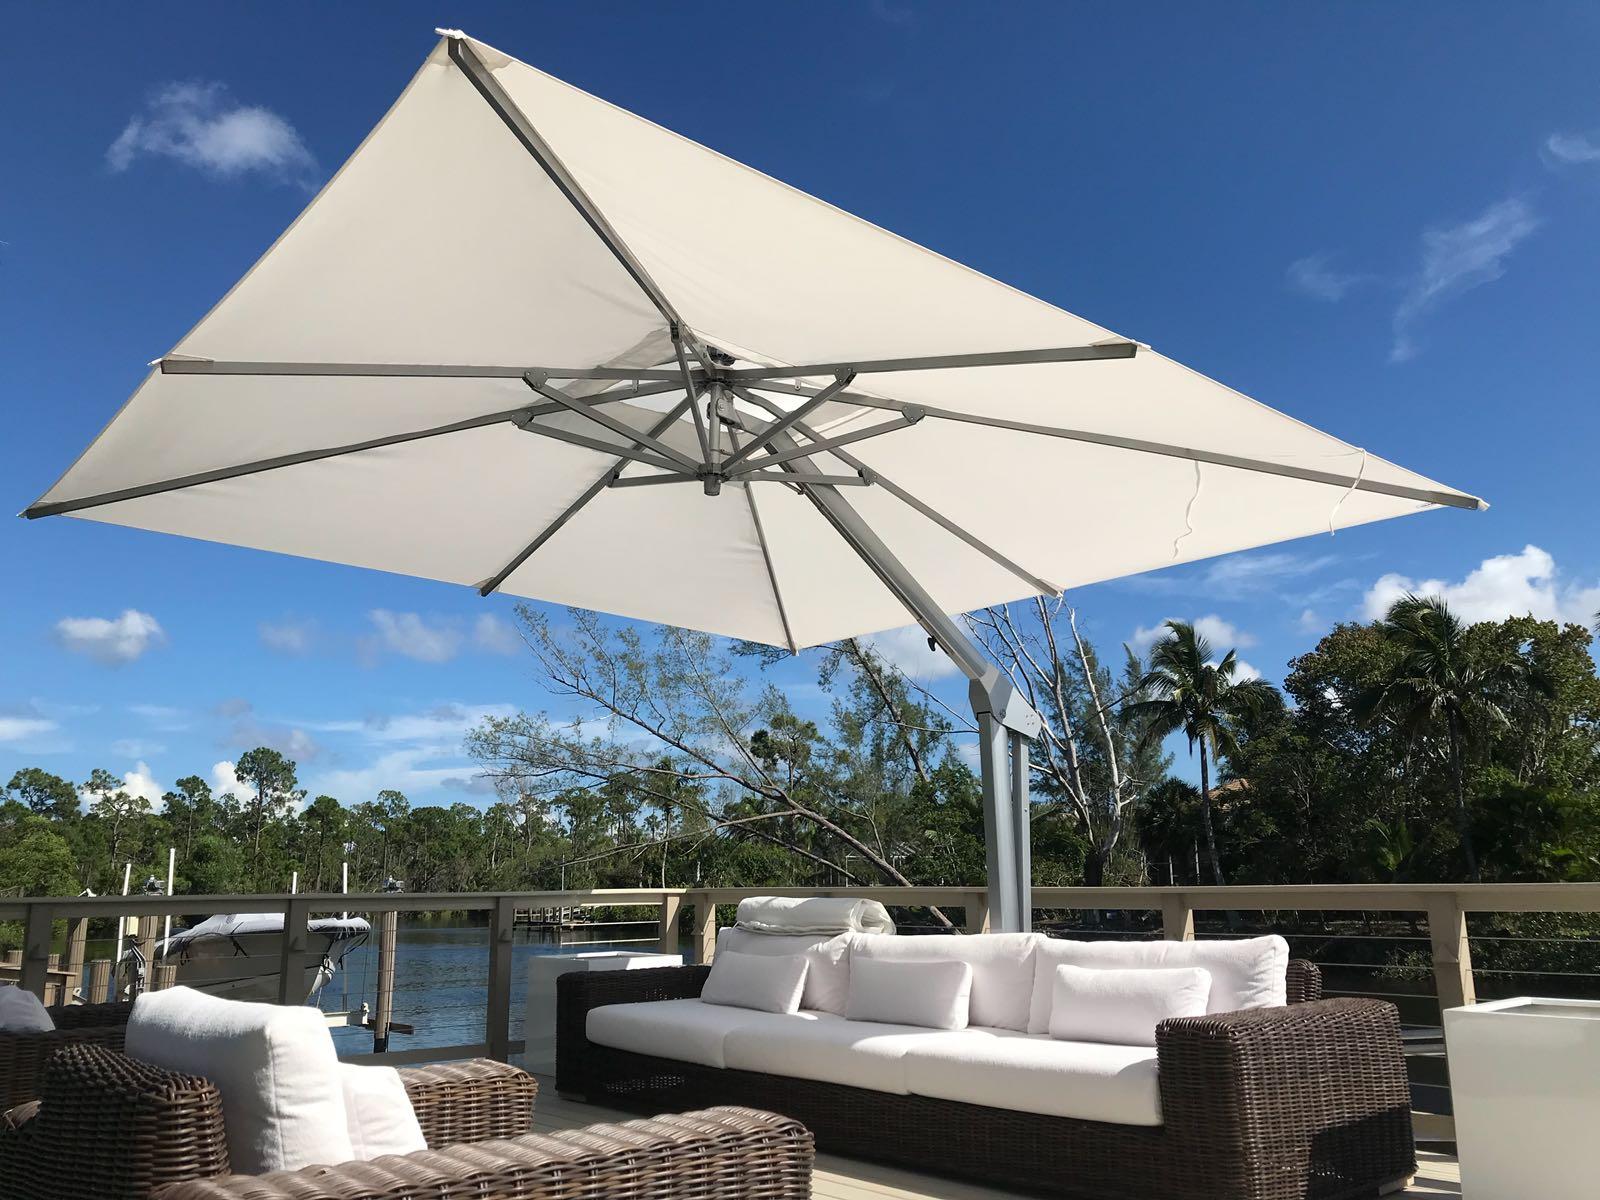 Cantilever Umbrellas With Regard To Popular Cantilever Umbrellas (View 16 of 20)